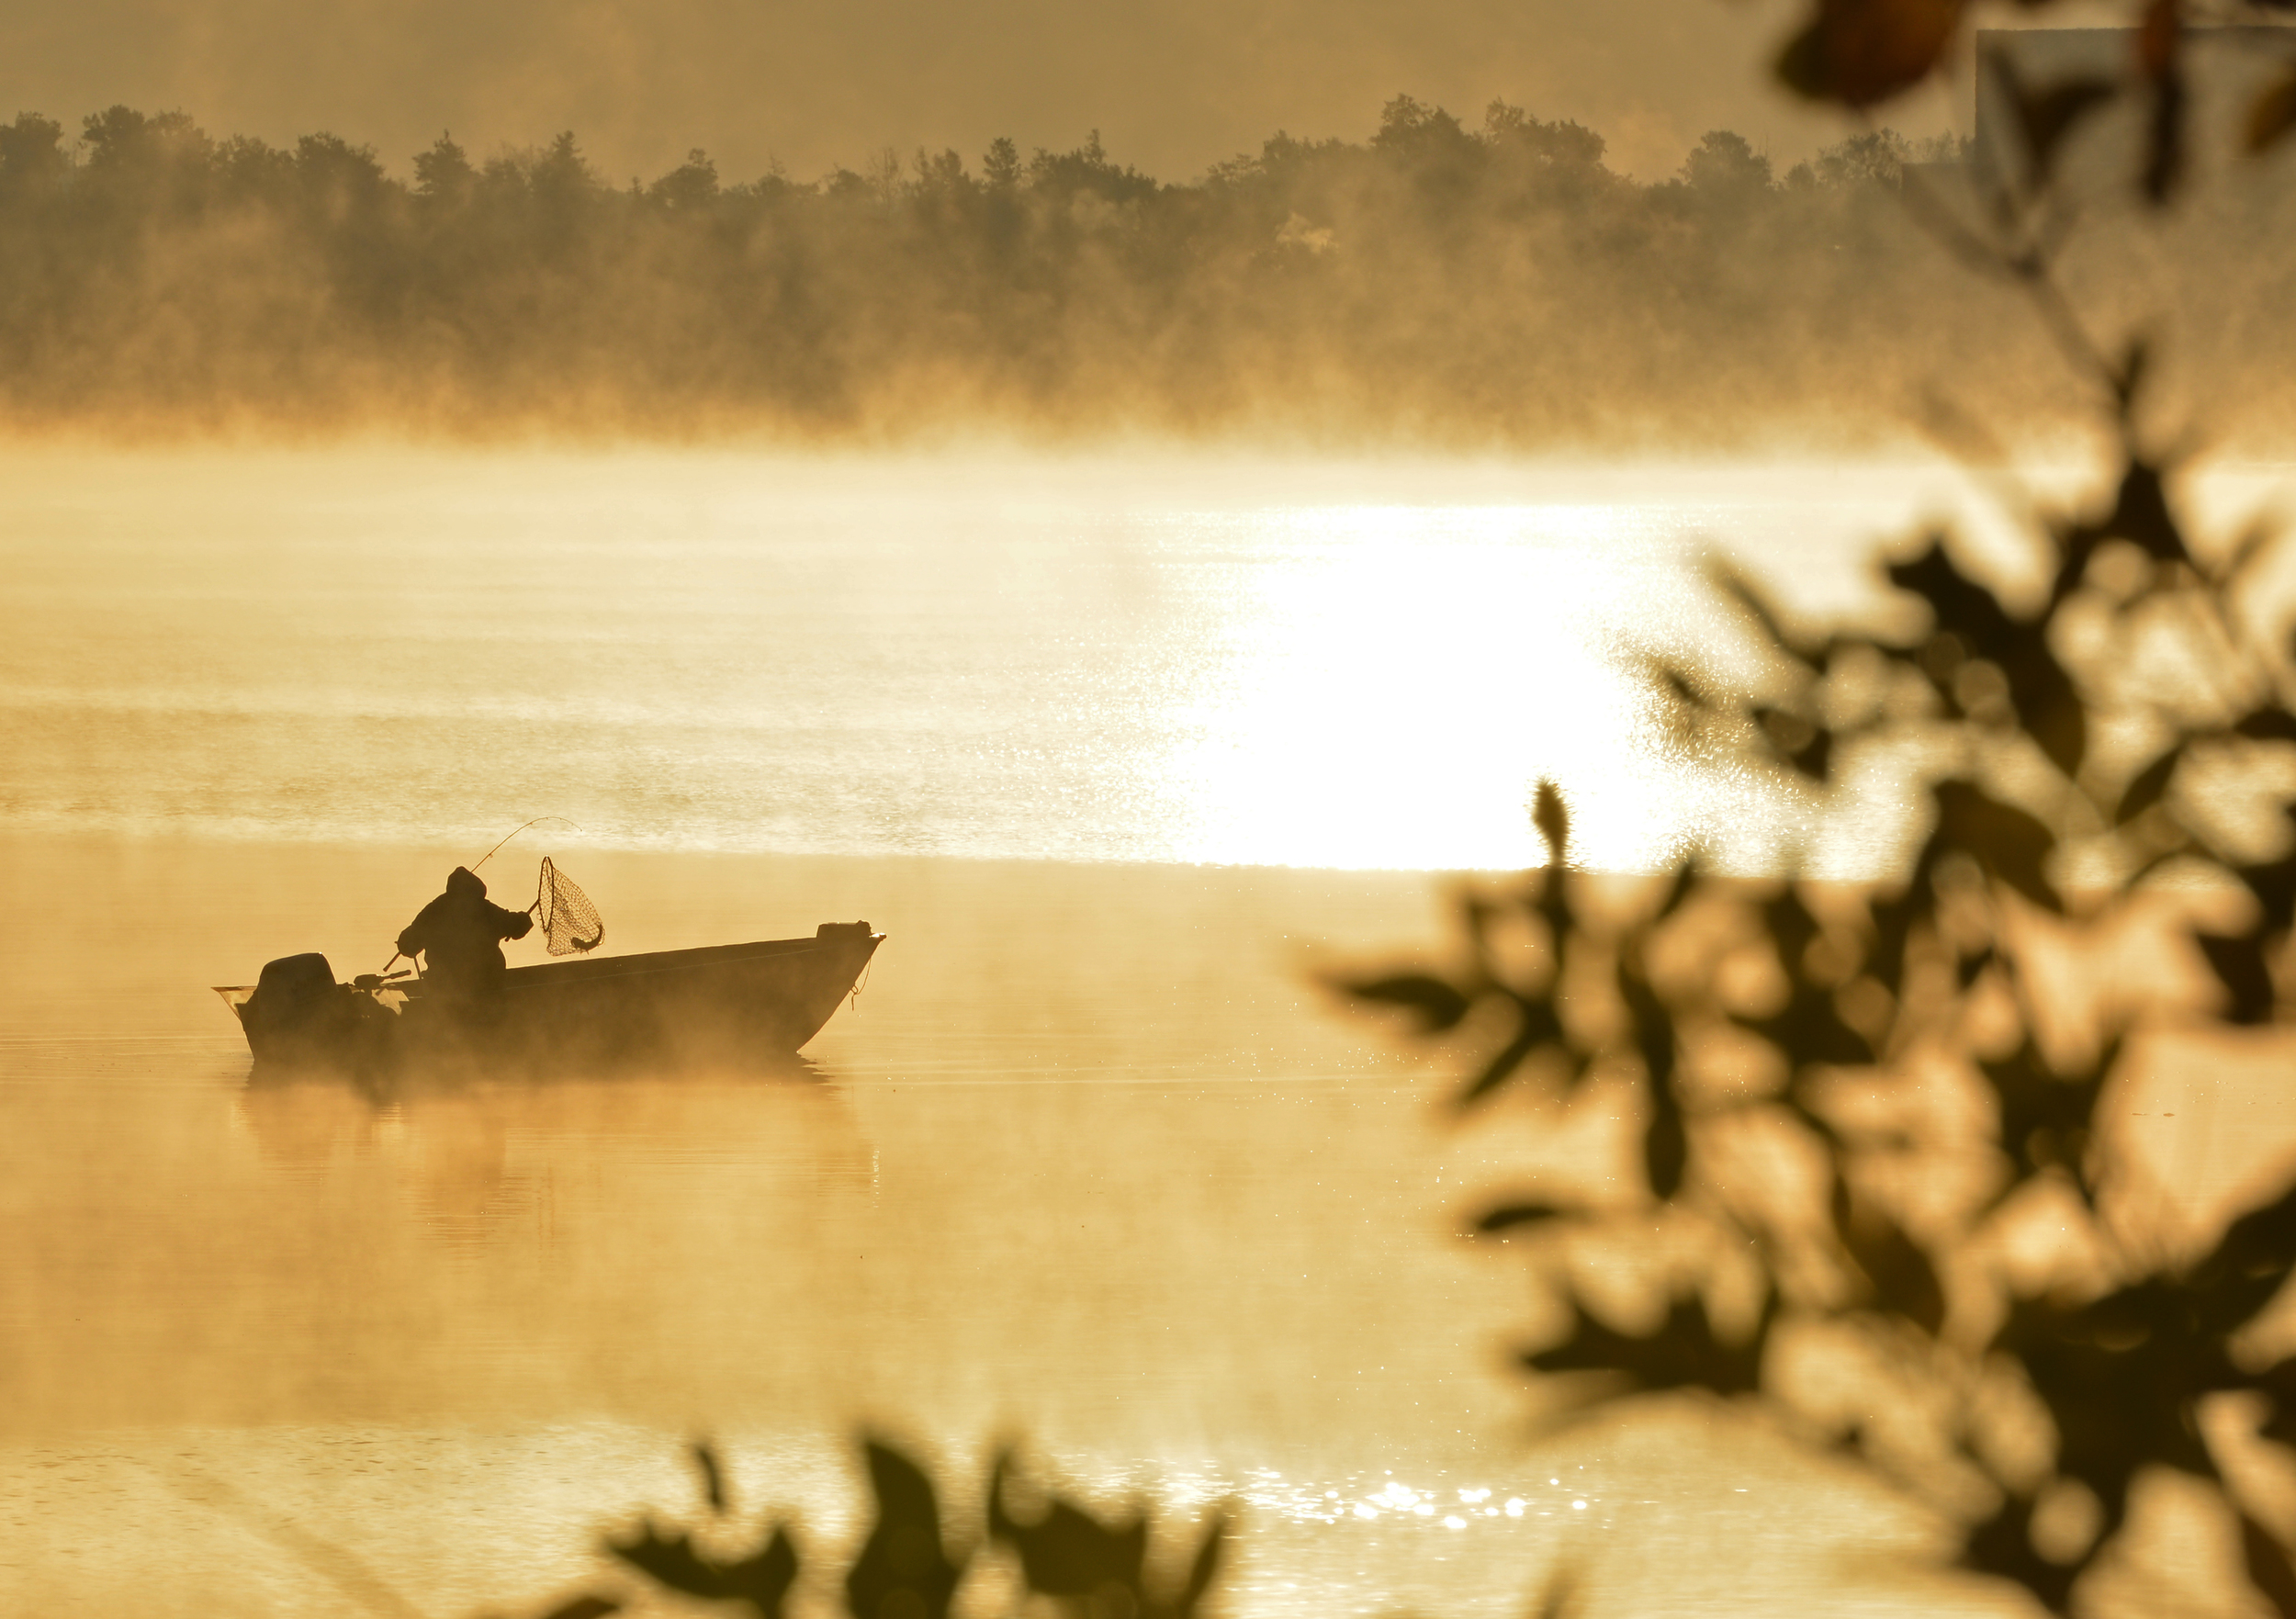 A fisherman nets a fish during a spectacular October sunrise over Lake Bemidji.